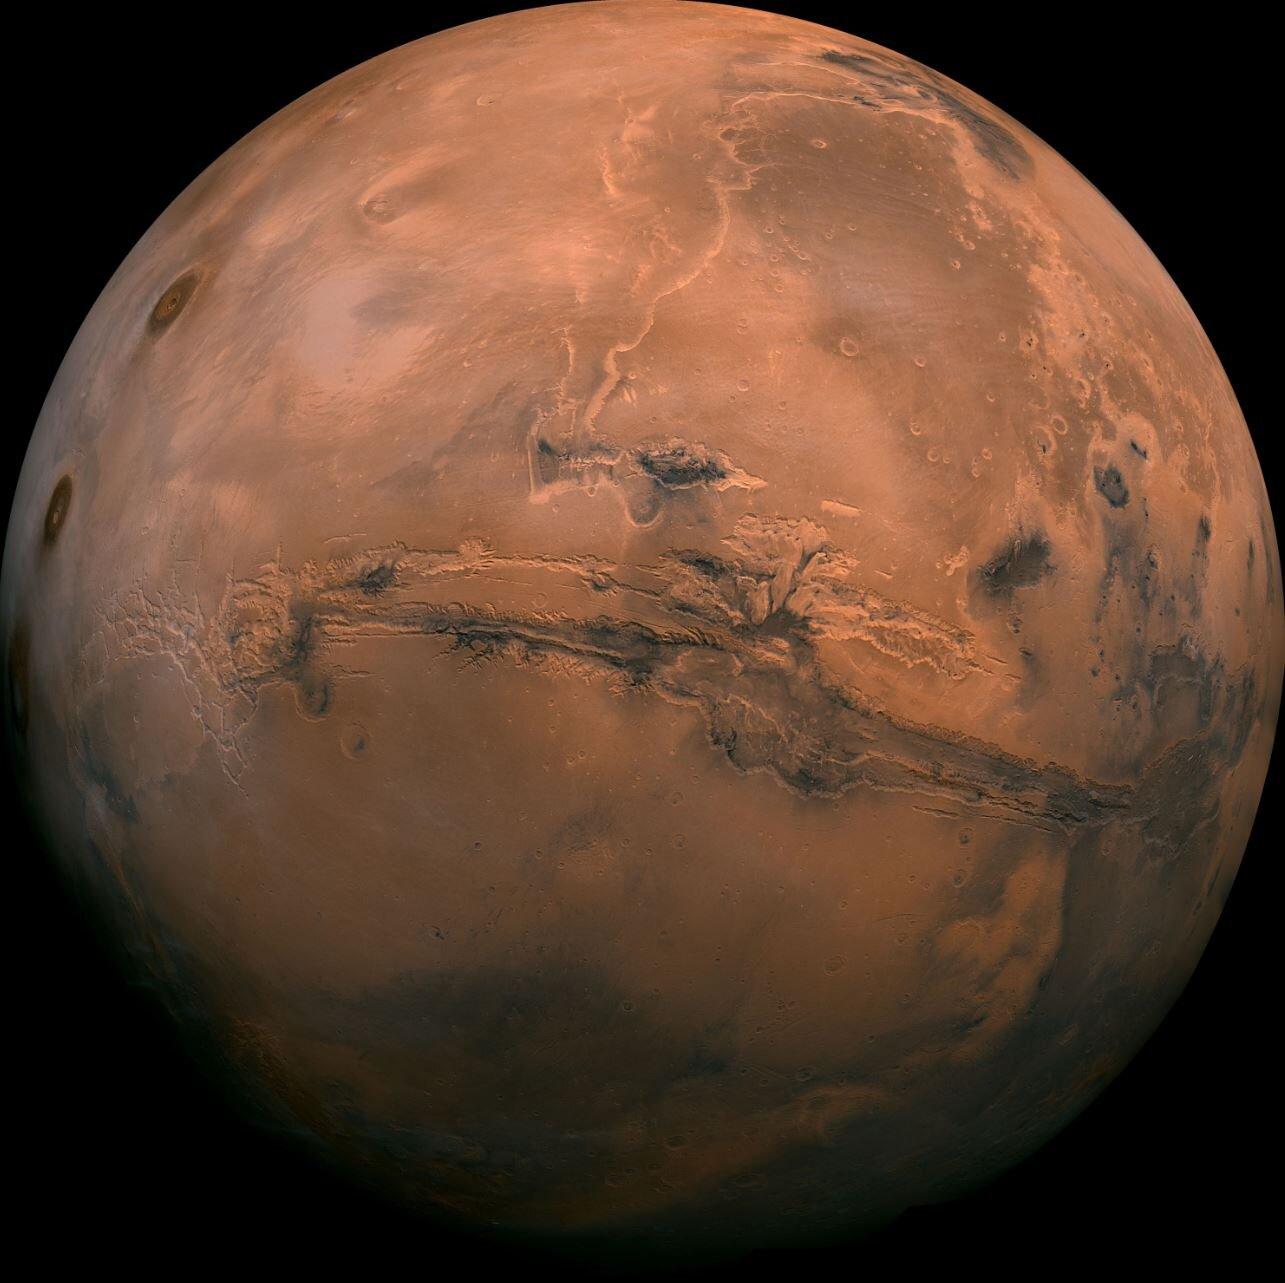 Mars - Image Credit:  NASA/JPL-Caltech